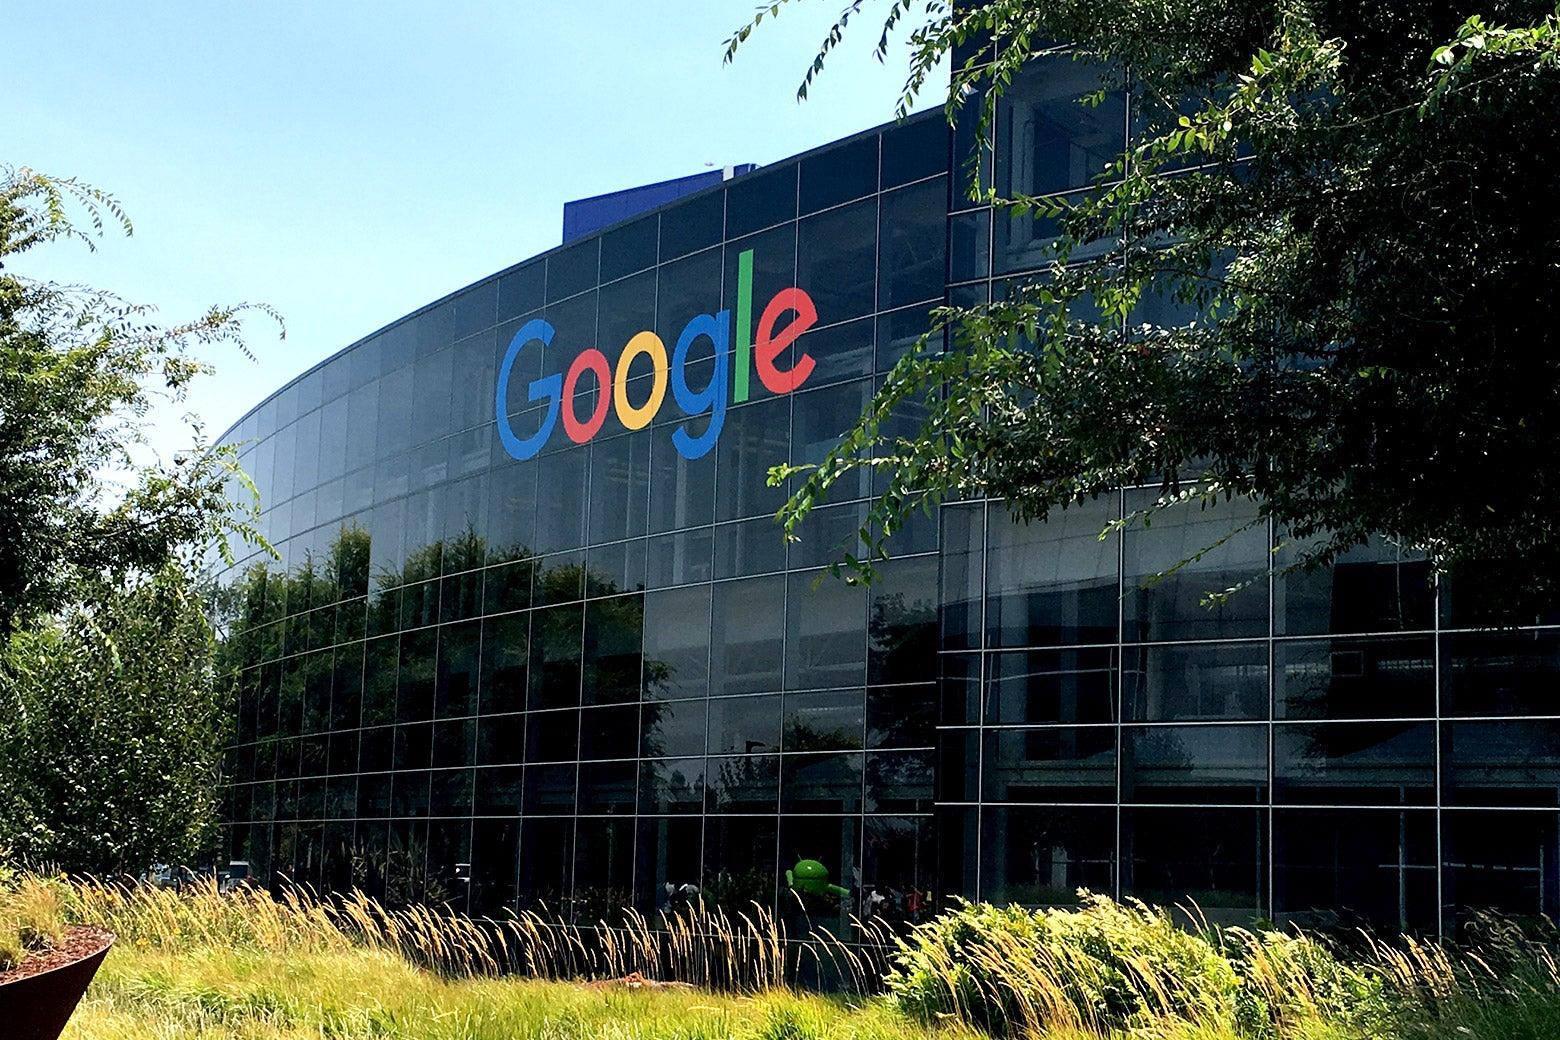 Googleplex in San Jose, California.